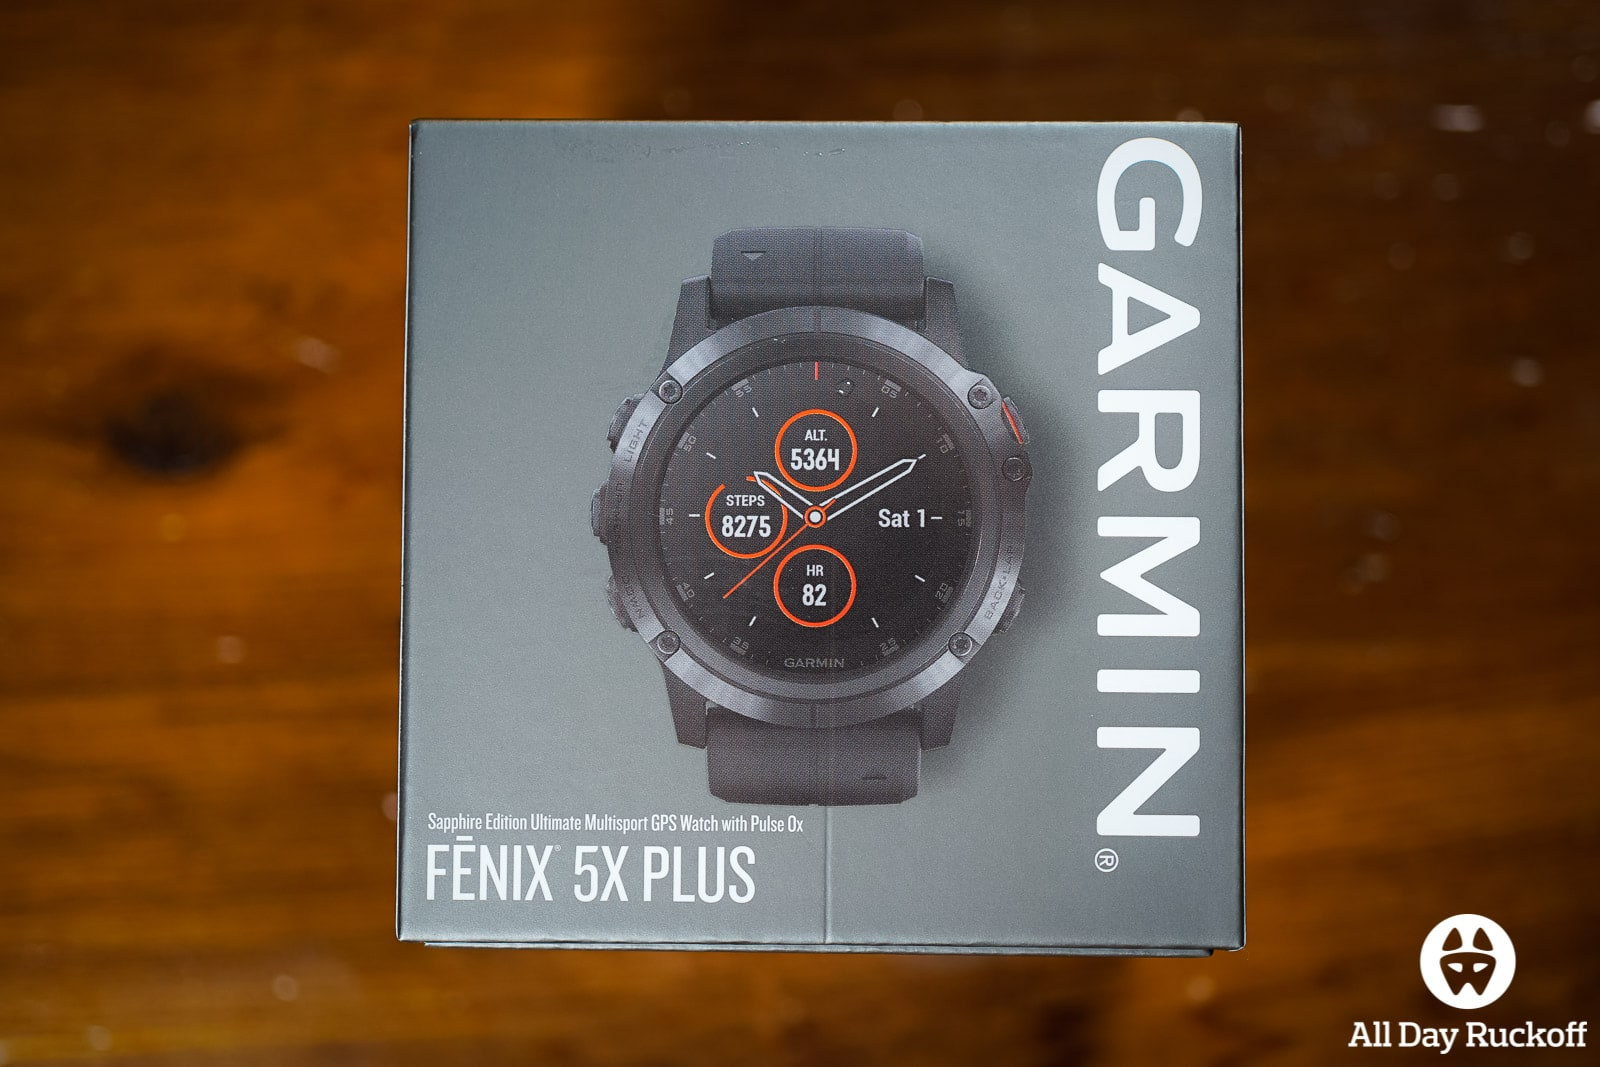 Garmin Fenix 5X Plus Preview & Initial Impressions - All Day Ruckoff